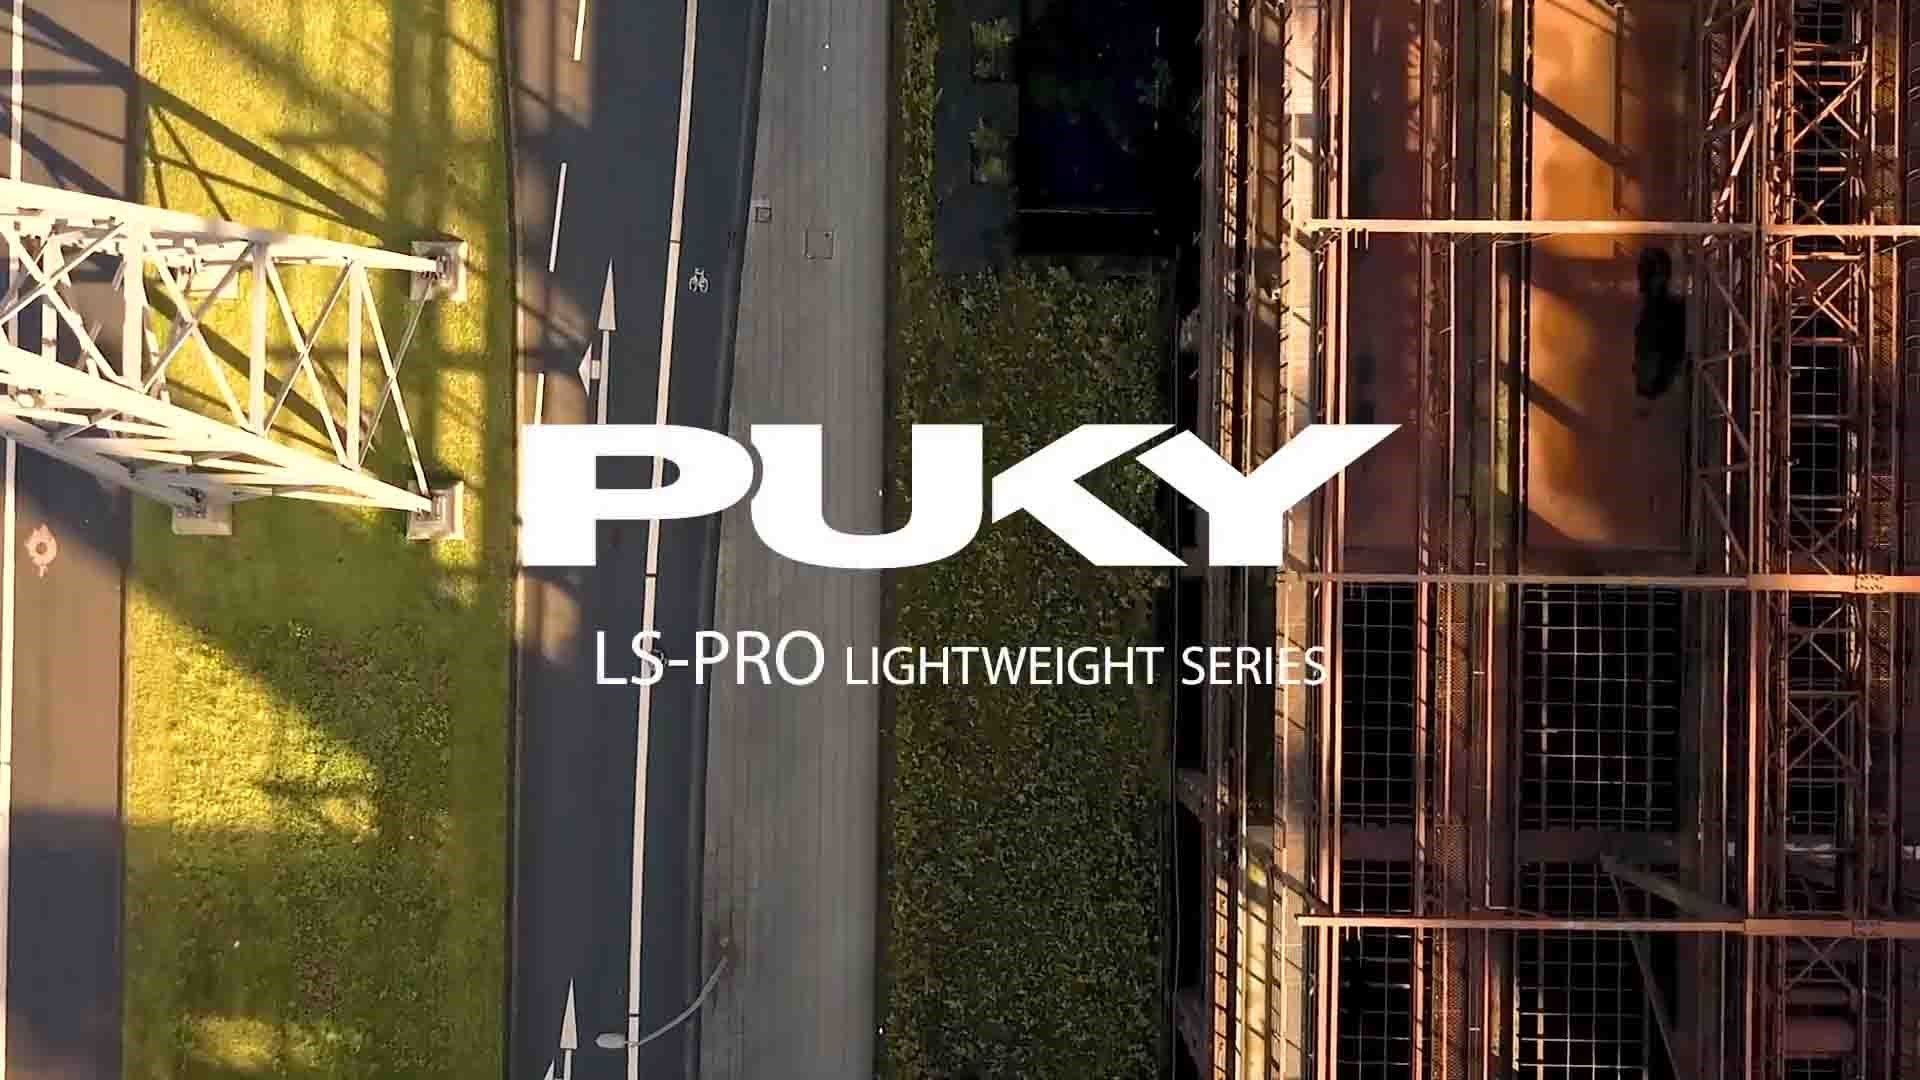 The Puky LS Pro Series